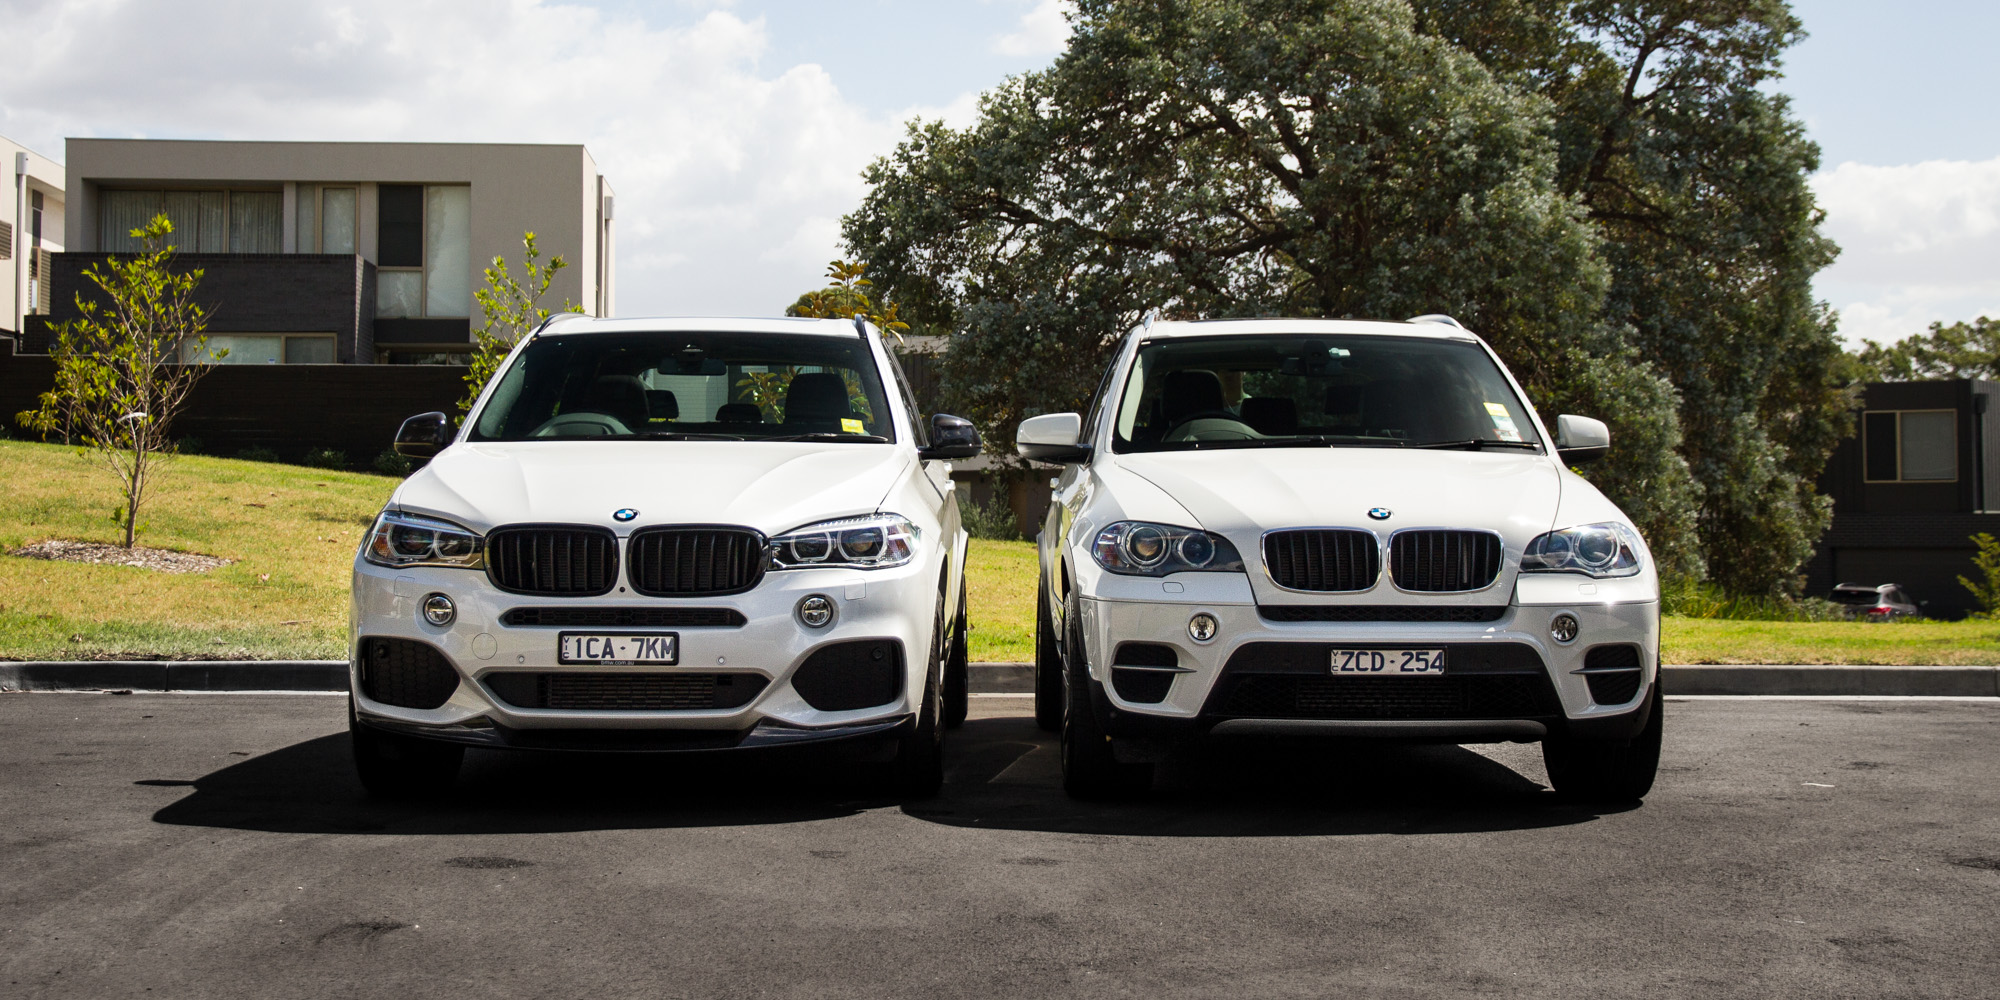 BMW X5 Old v New comparison: Second-generation E70 v third